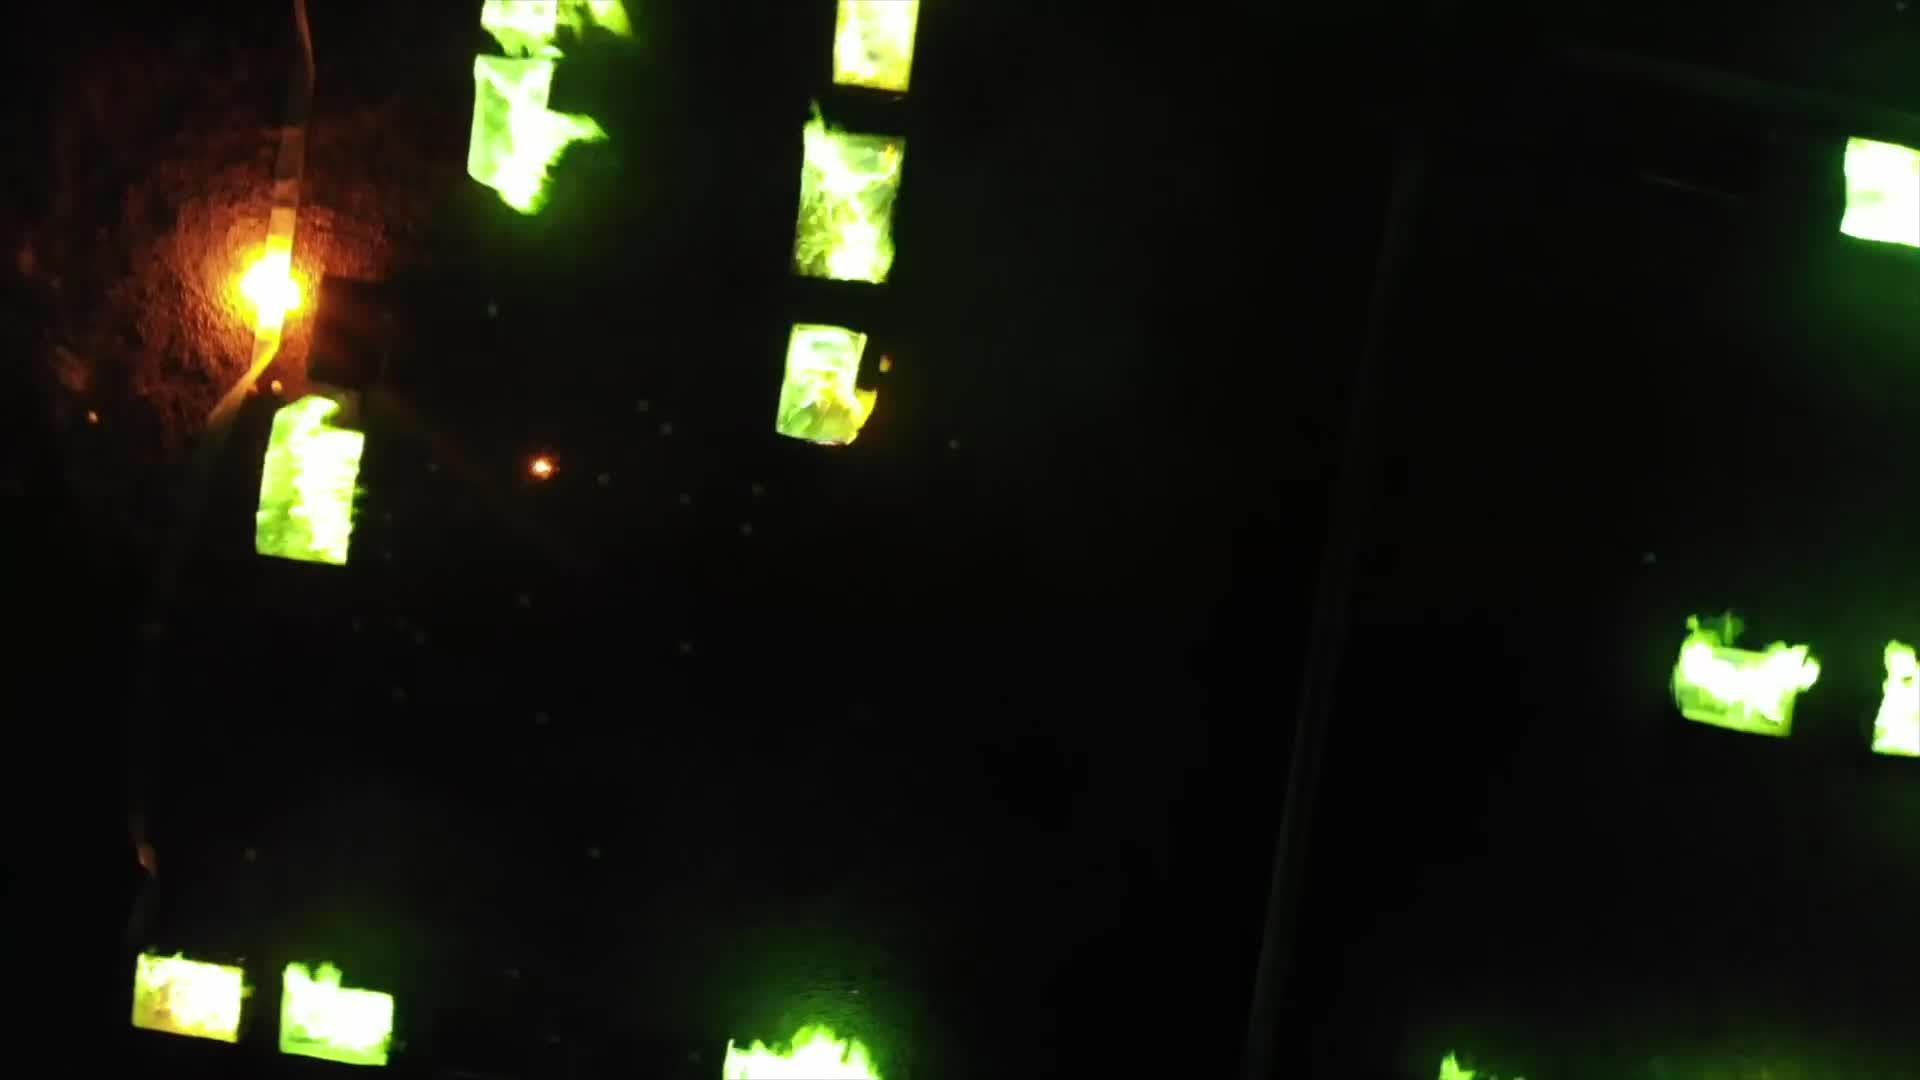 3kspecial, battle of blackwater, bunny vlogs, bunny vlogs technopolis, fire experiment, game of thrones, got, green fire, groen vuur, rip bunny vlogs, technopolis, technopolis bunny, technopolis mechelen, technopolis special, technopolis vlog, tyrion, wildfire, Wildfire Battleship IRL 🔥🤓 GIFs